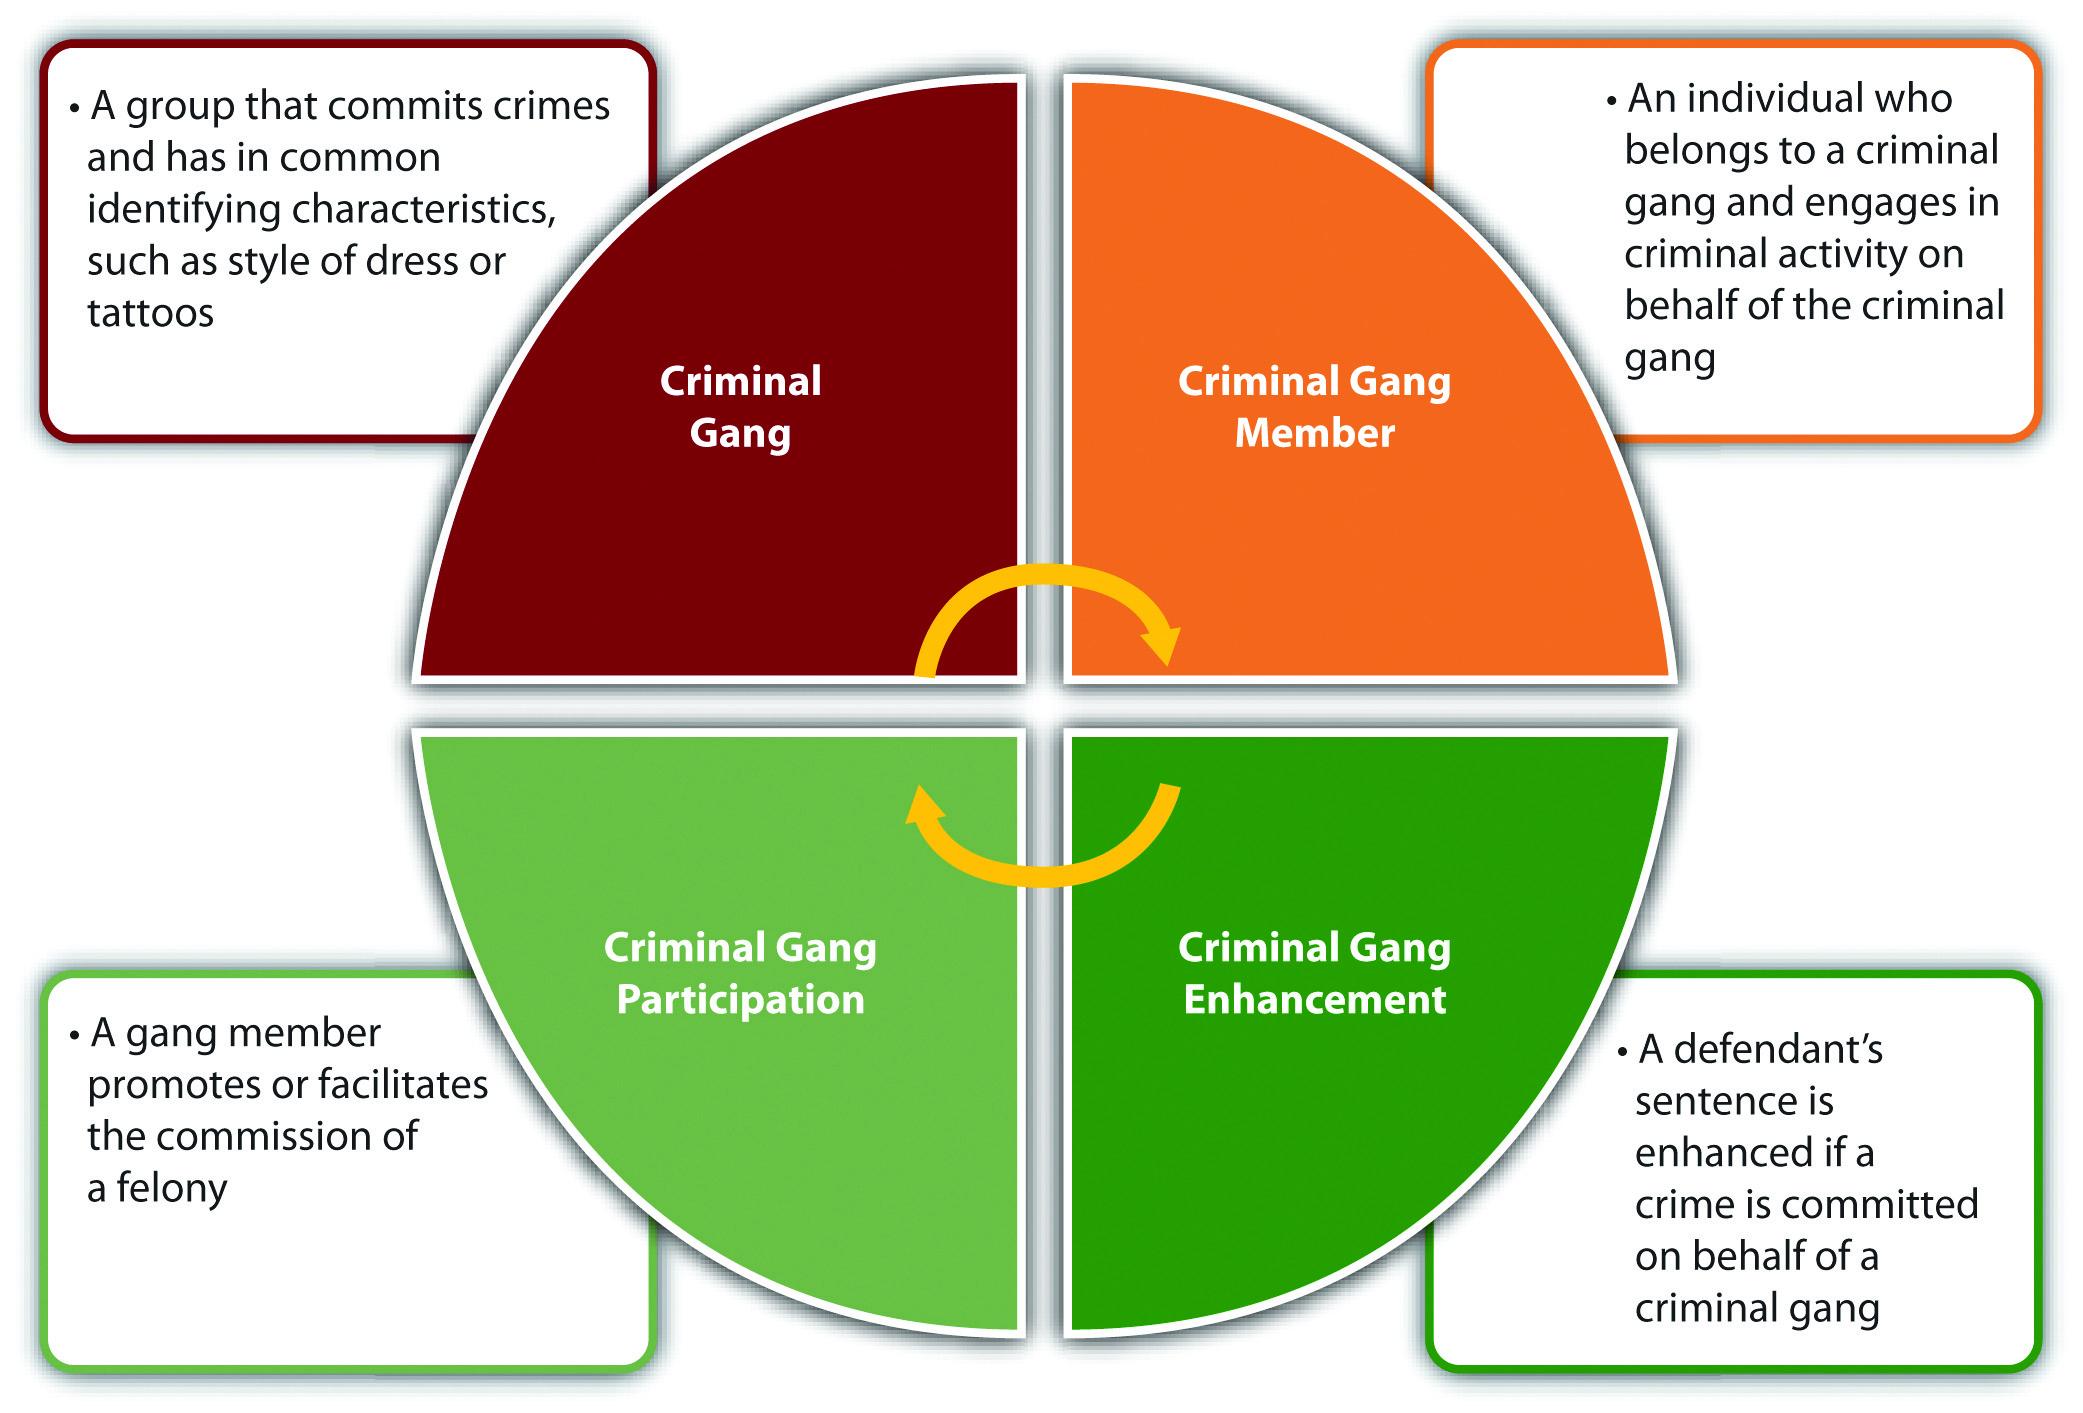 Diagram of Typical Modern Gang Statutes